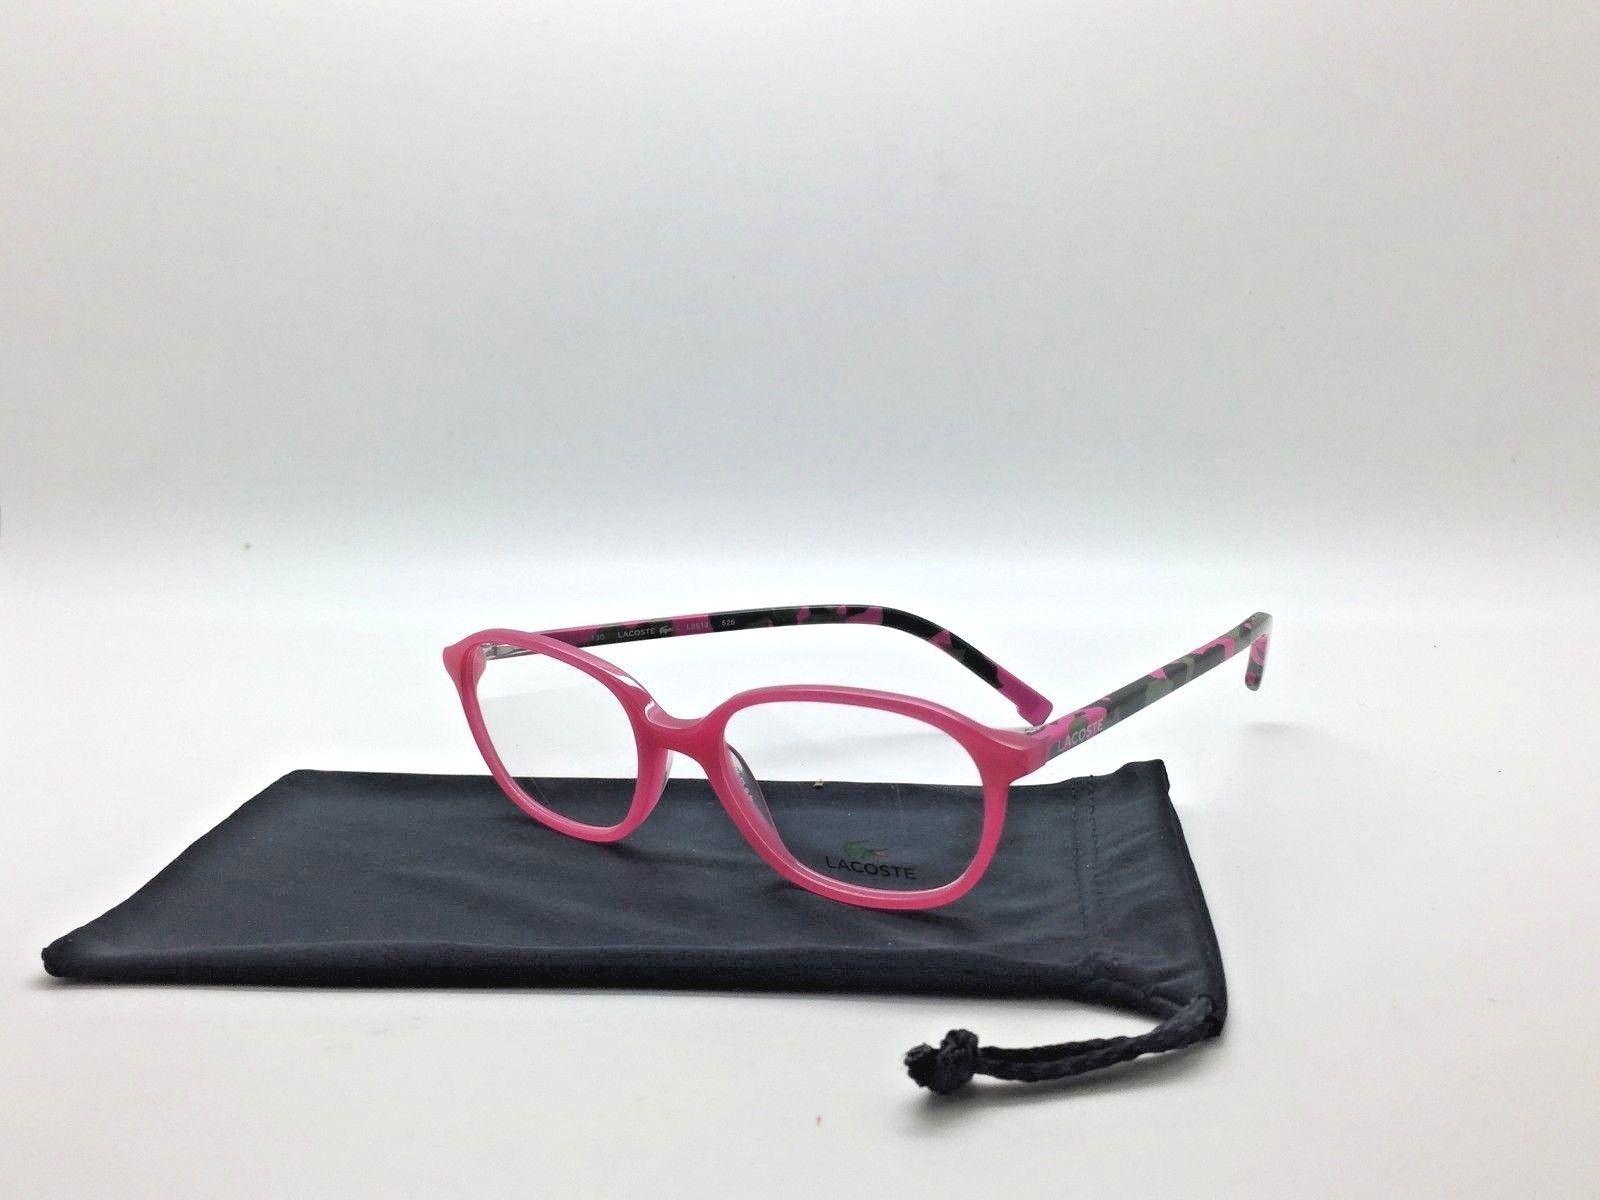 59e6e1e0e8 NEW Lacoste L3613 525 48mm Pink Optical and 47 similar items